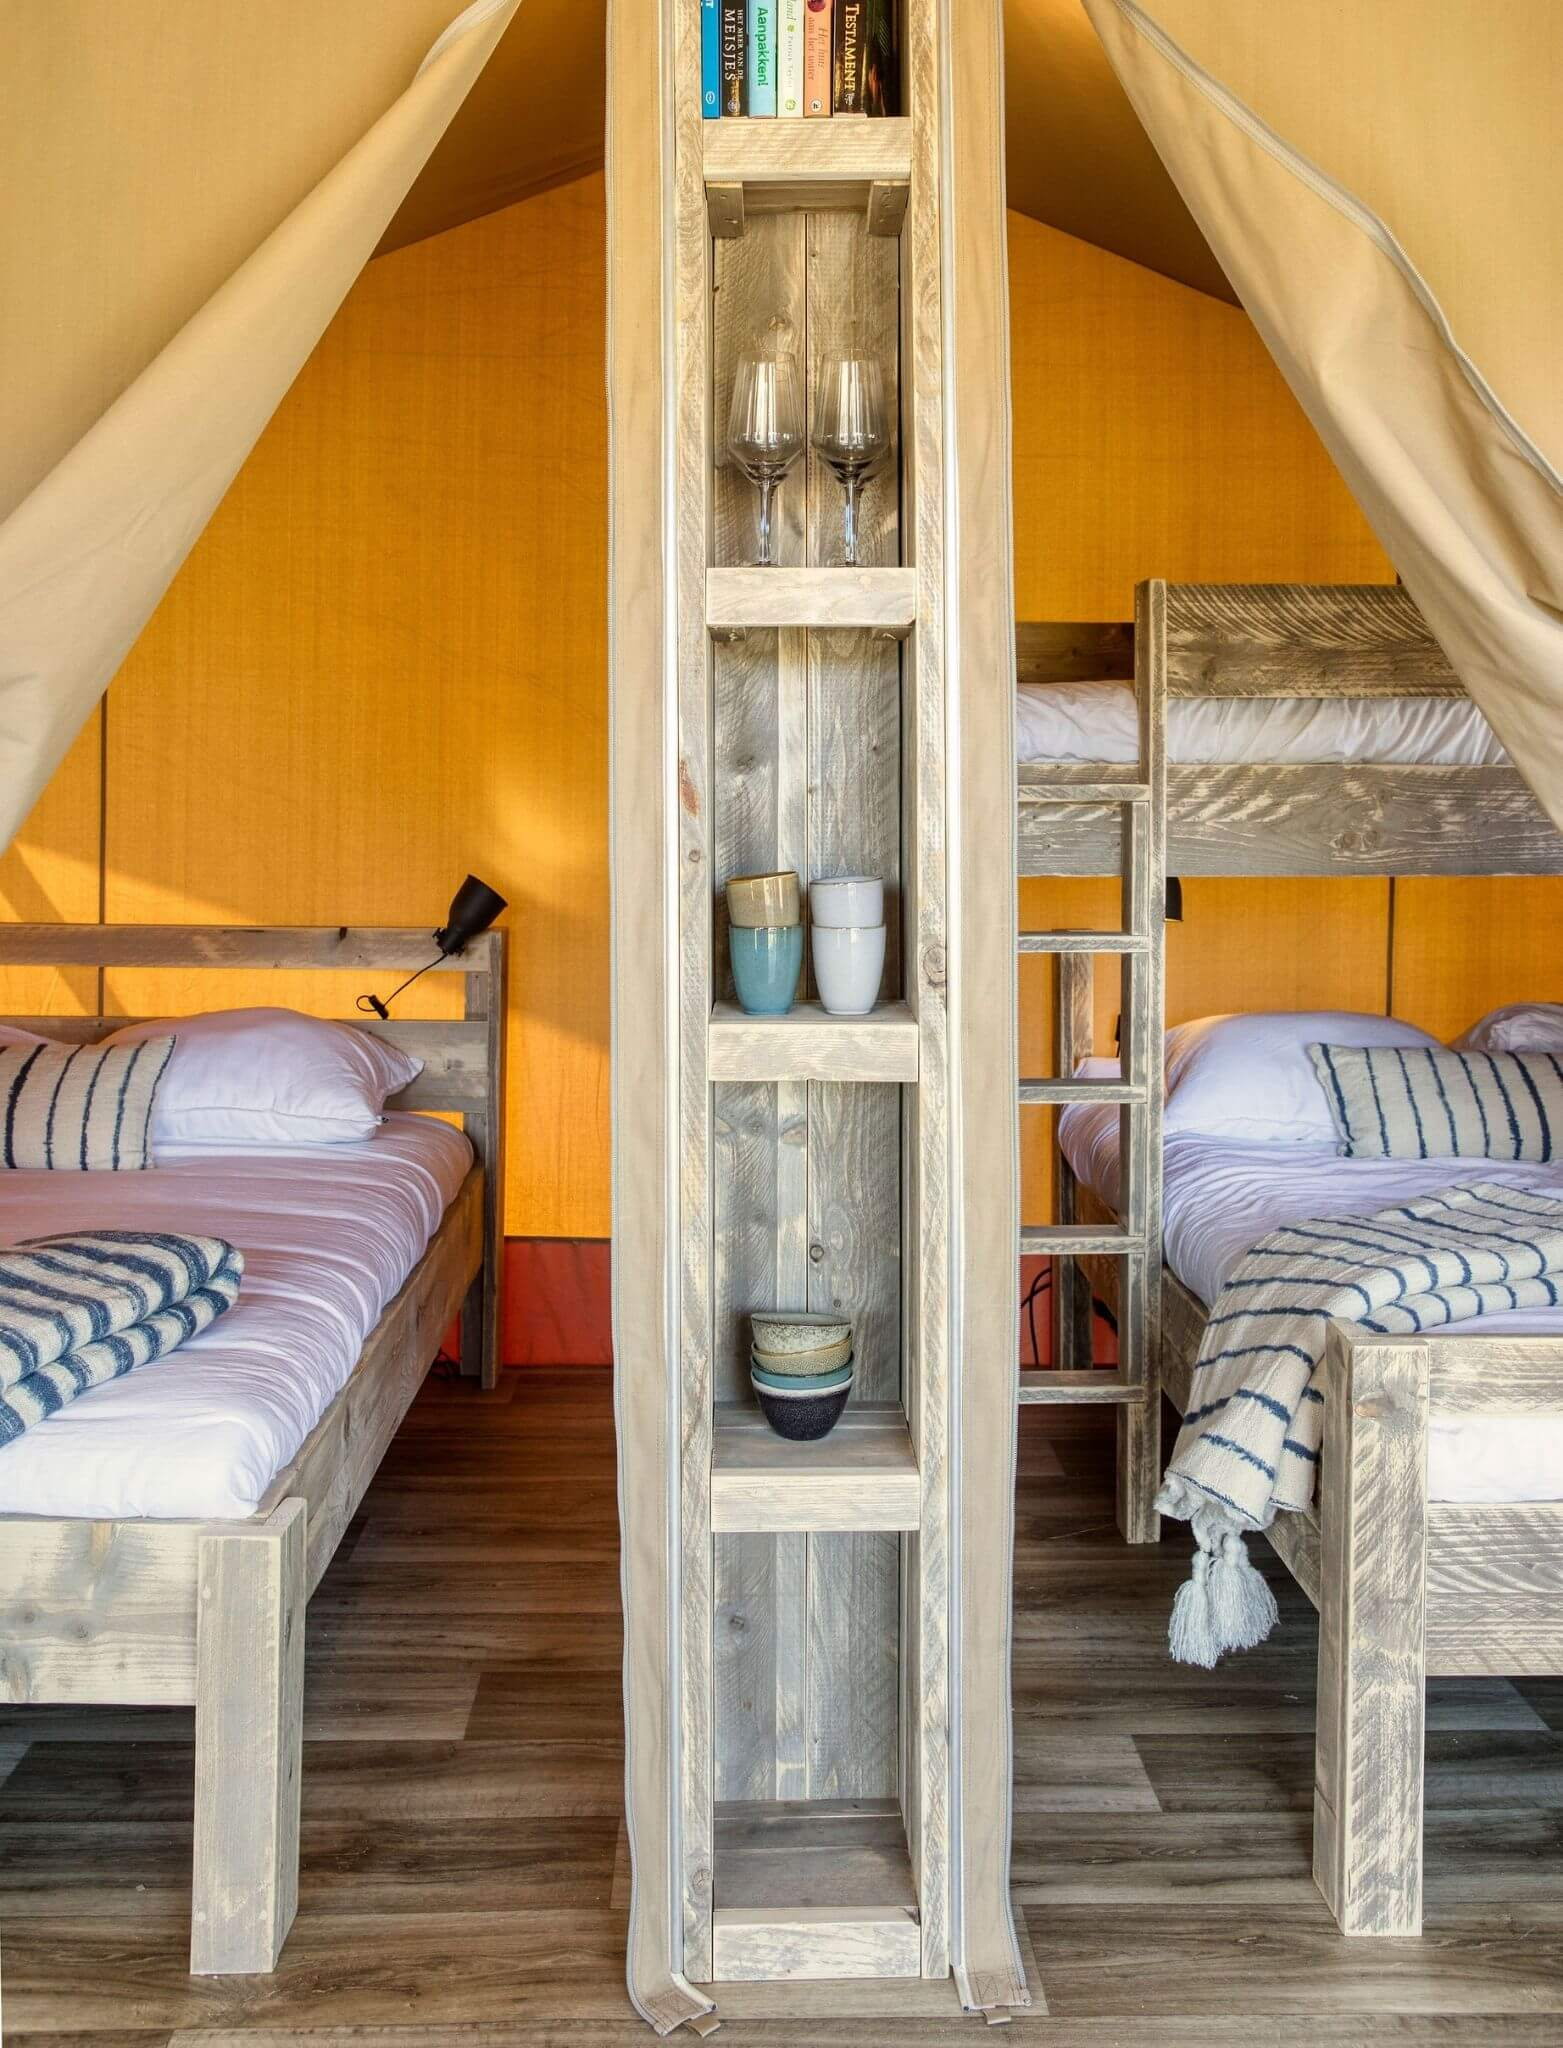 YALA_interior_Raw_interior_bedrooms_closet_in_front